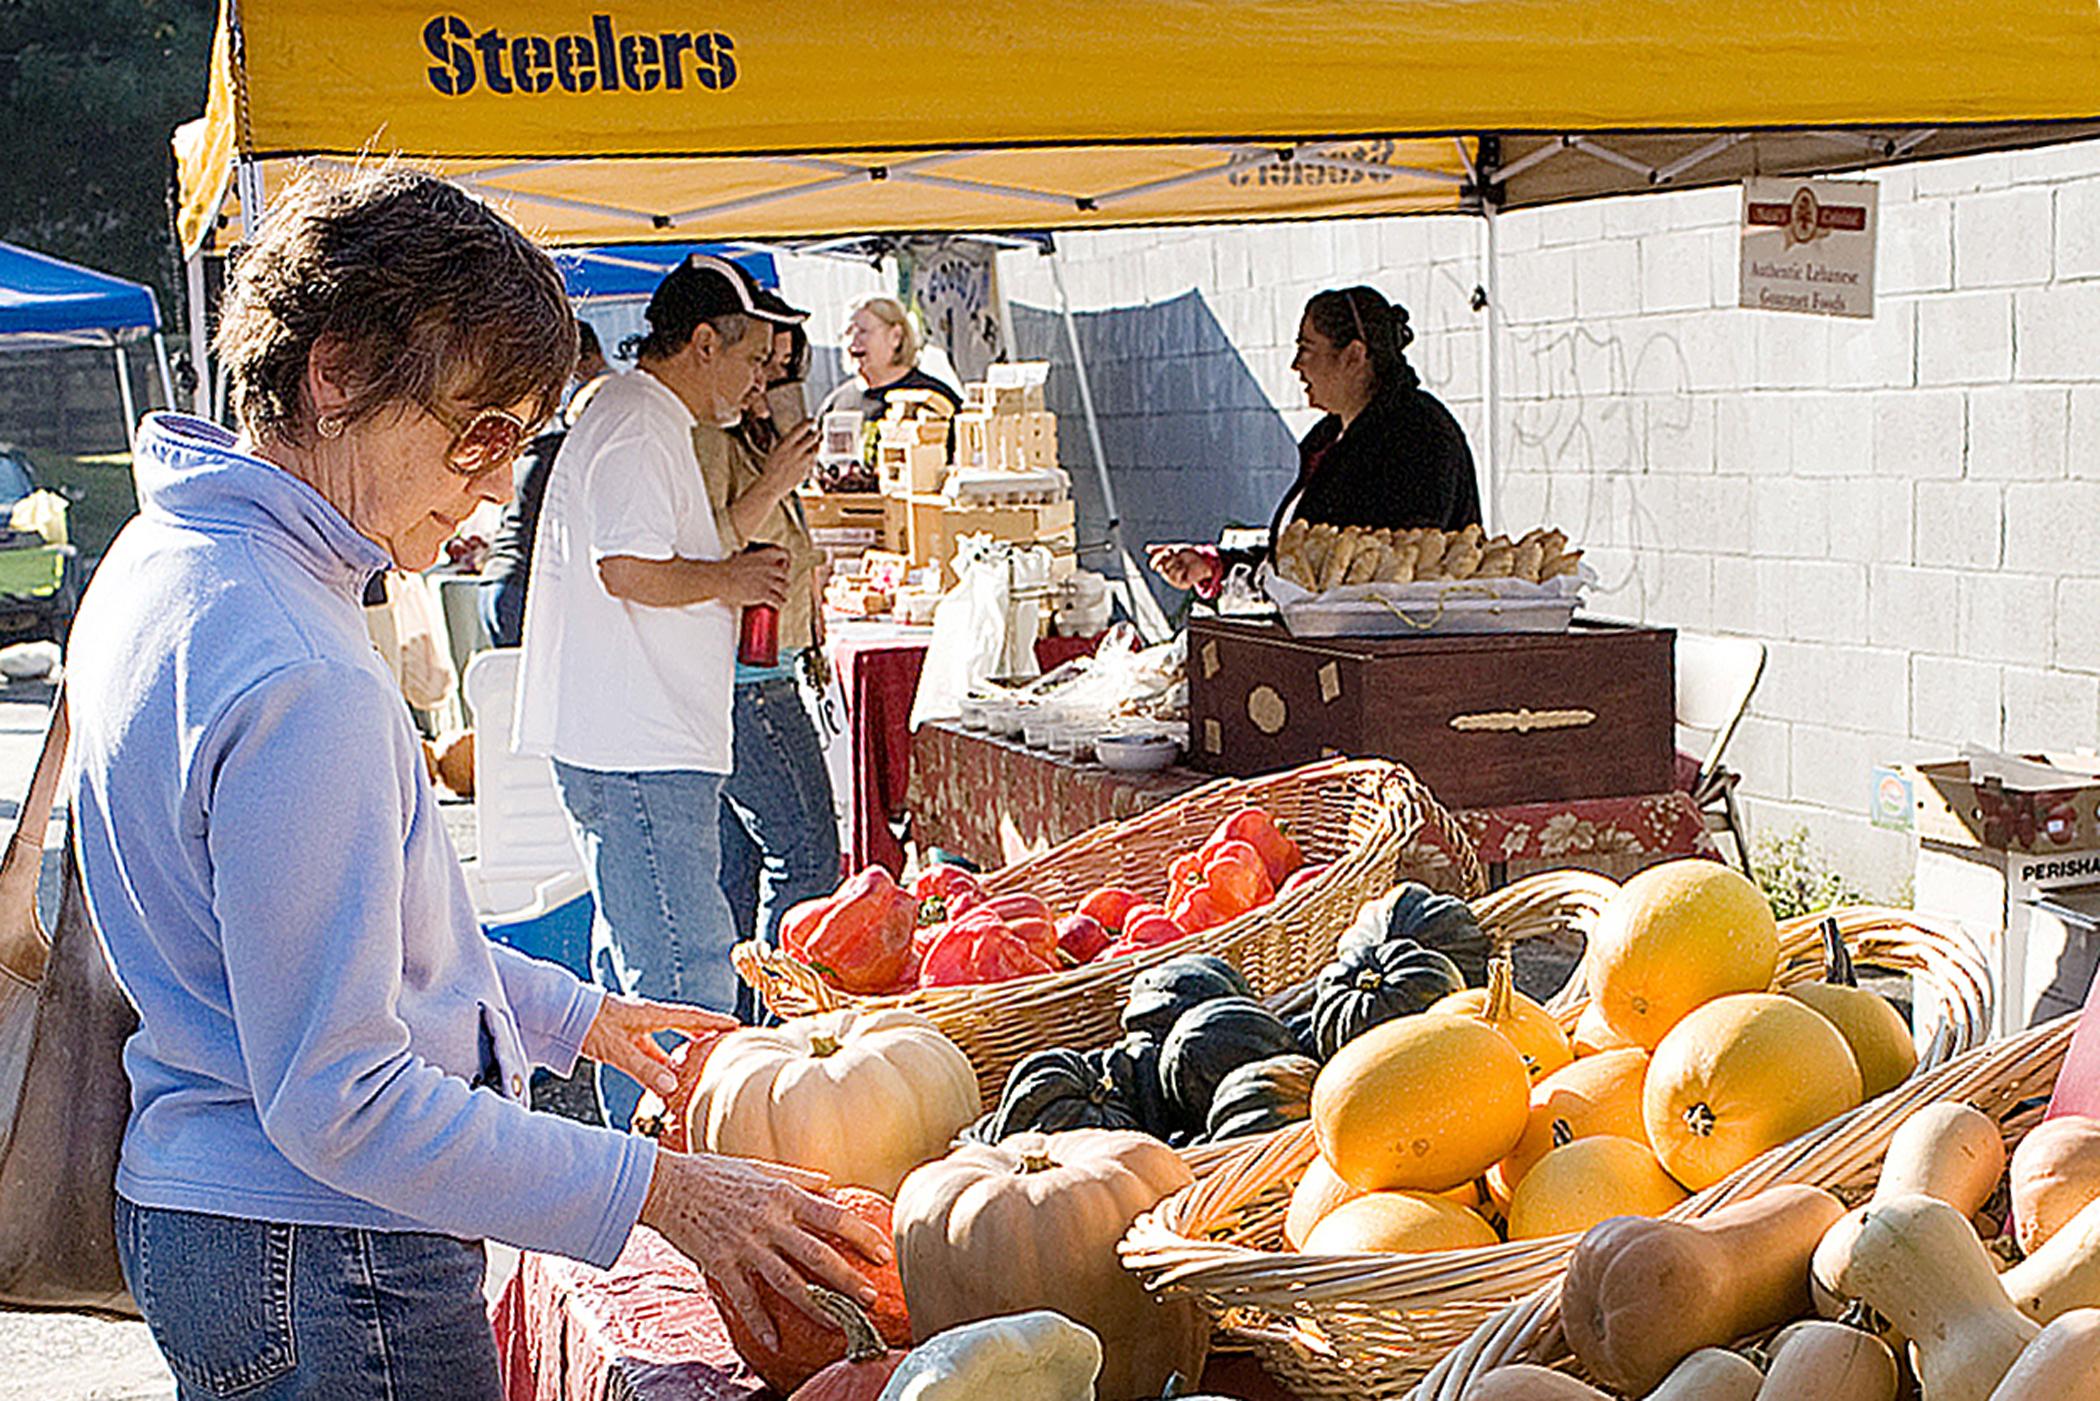 Saturday Farmers Market on The Strip District, Penn Avenue, Pittsburgh, Pennsylvania